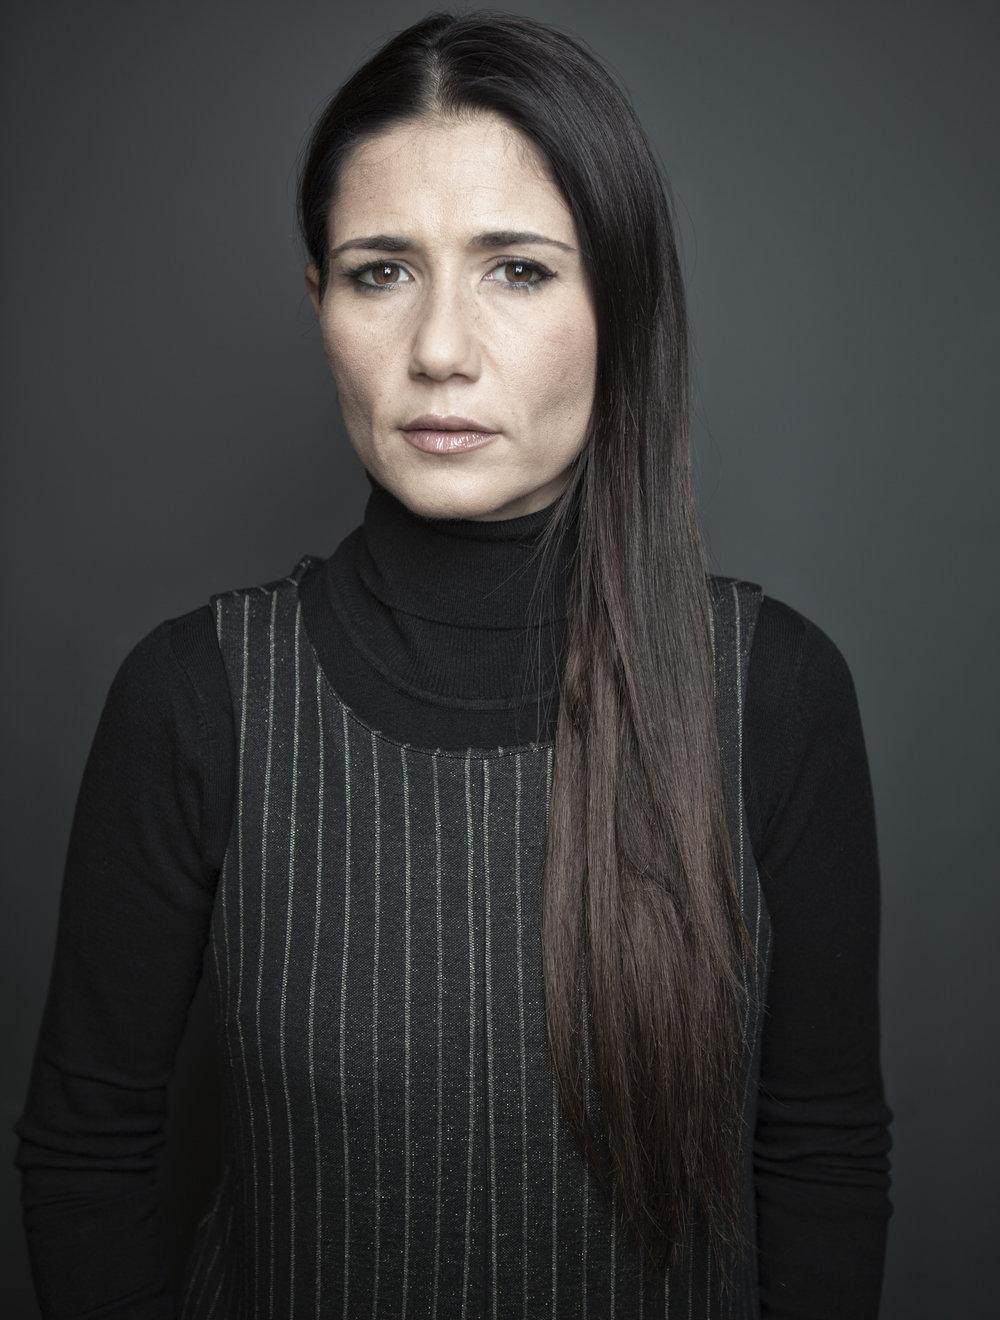 Chelsea Tavares